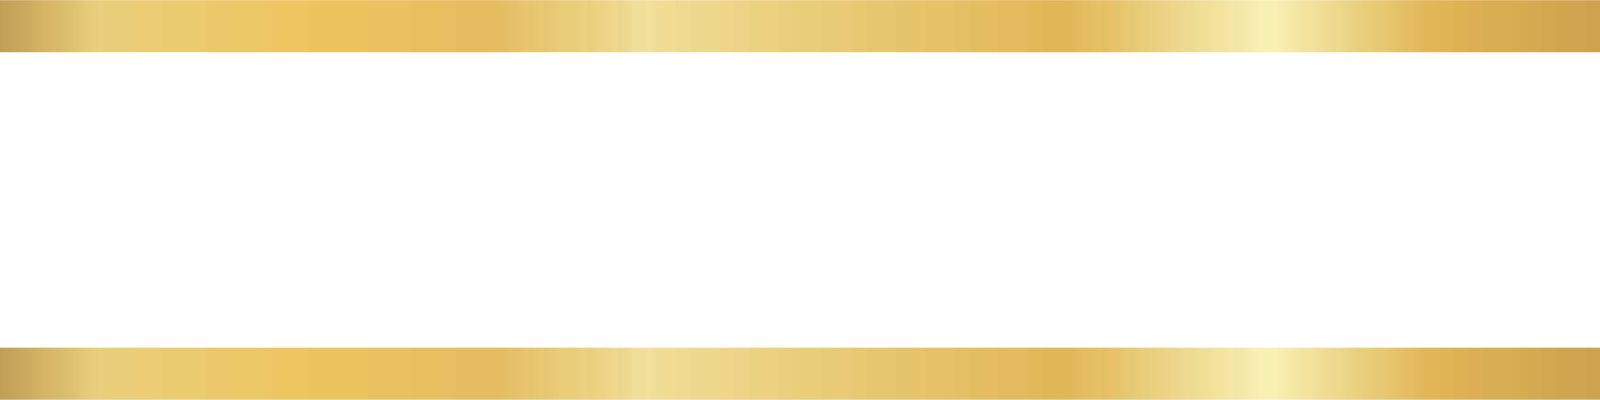 Gold Border Background